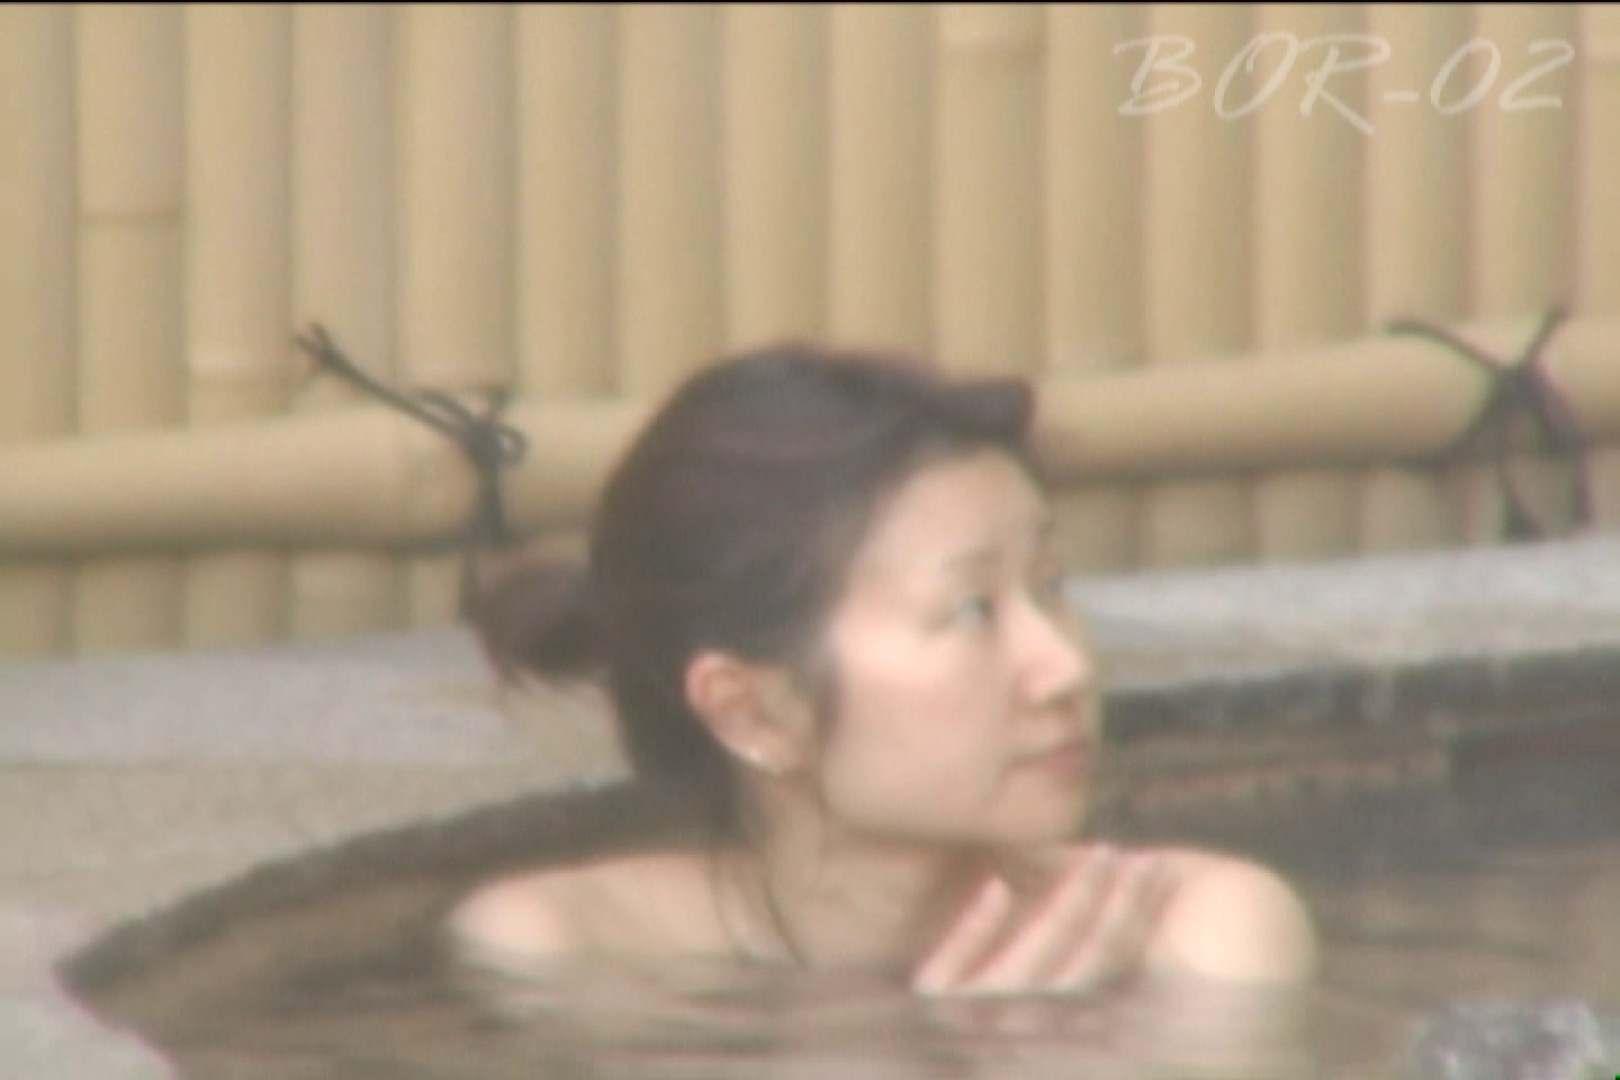 Aquaな露天風呂Vol.477 盗撮シリーズ | 露天風呂編  104PIX 15